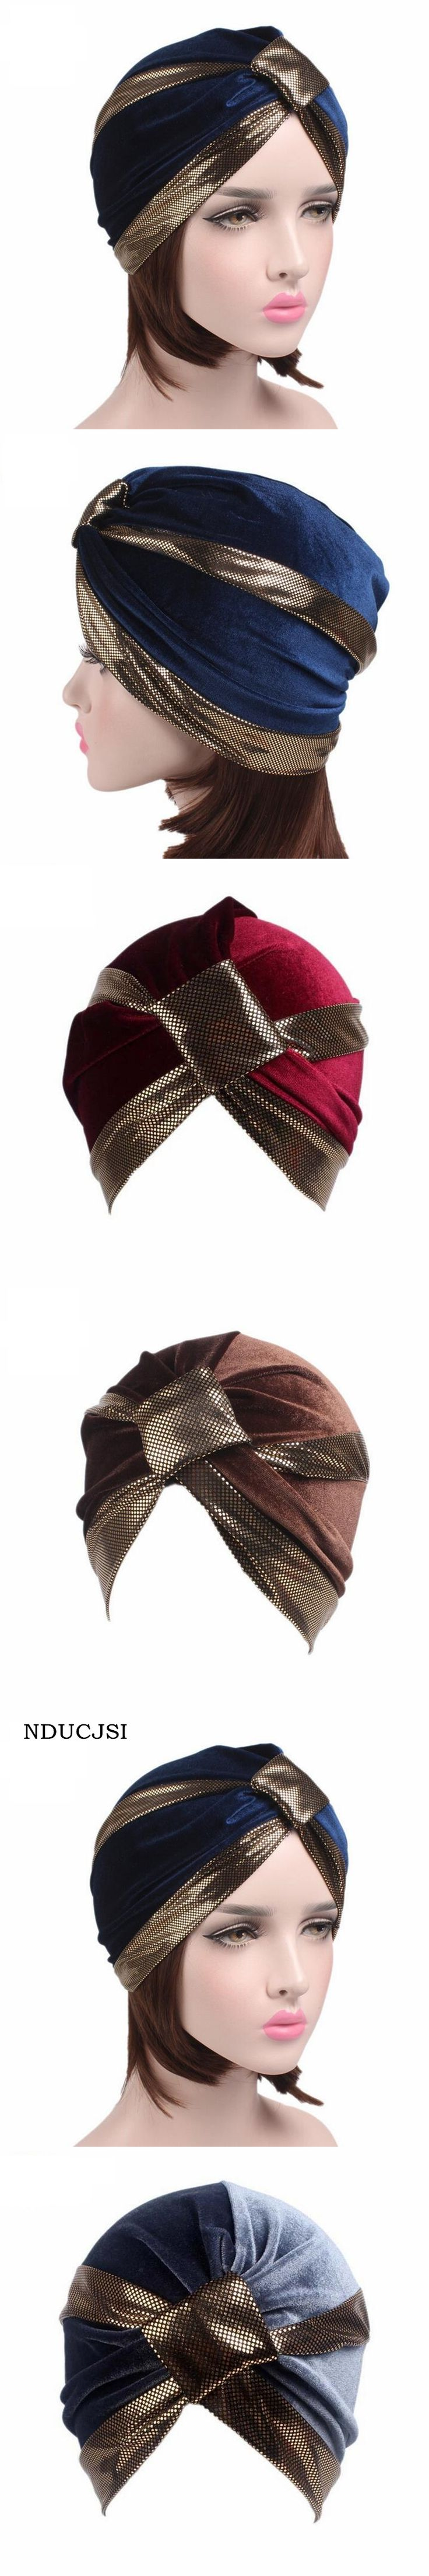 NDUCJSI Fashion Unisex Skullies Neon Stretchy Patchwork Turban Wrap Women Beanies Velvet Sleep Hats Adult Casual India Ear Caps